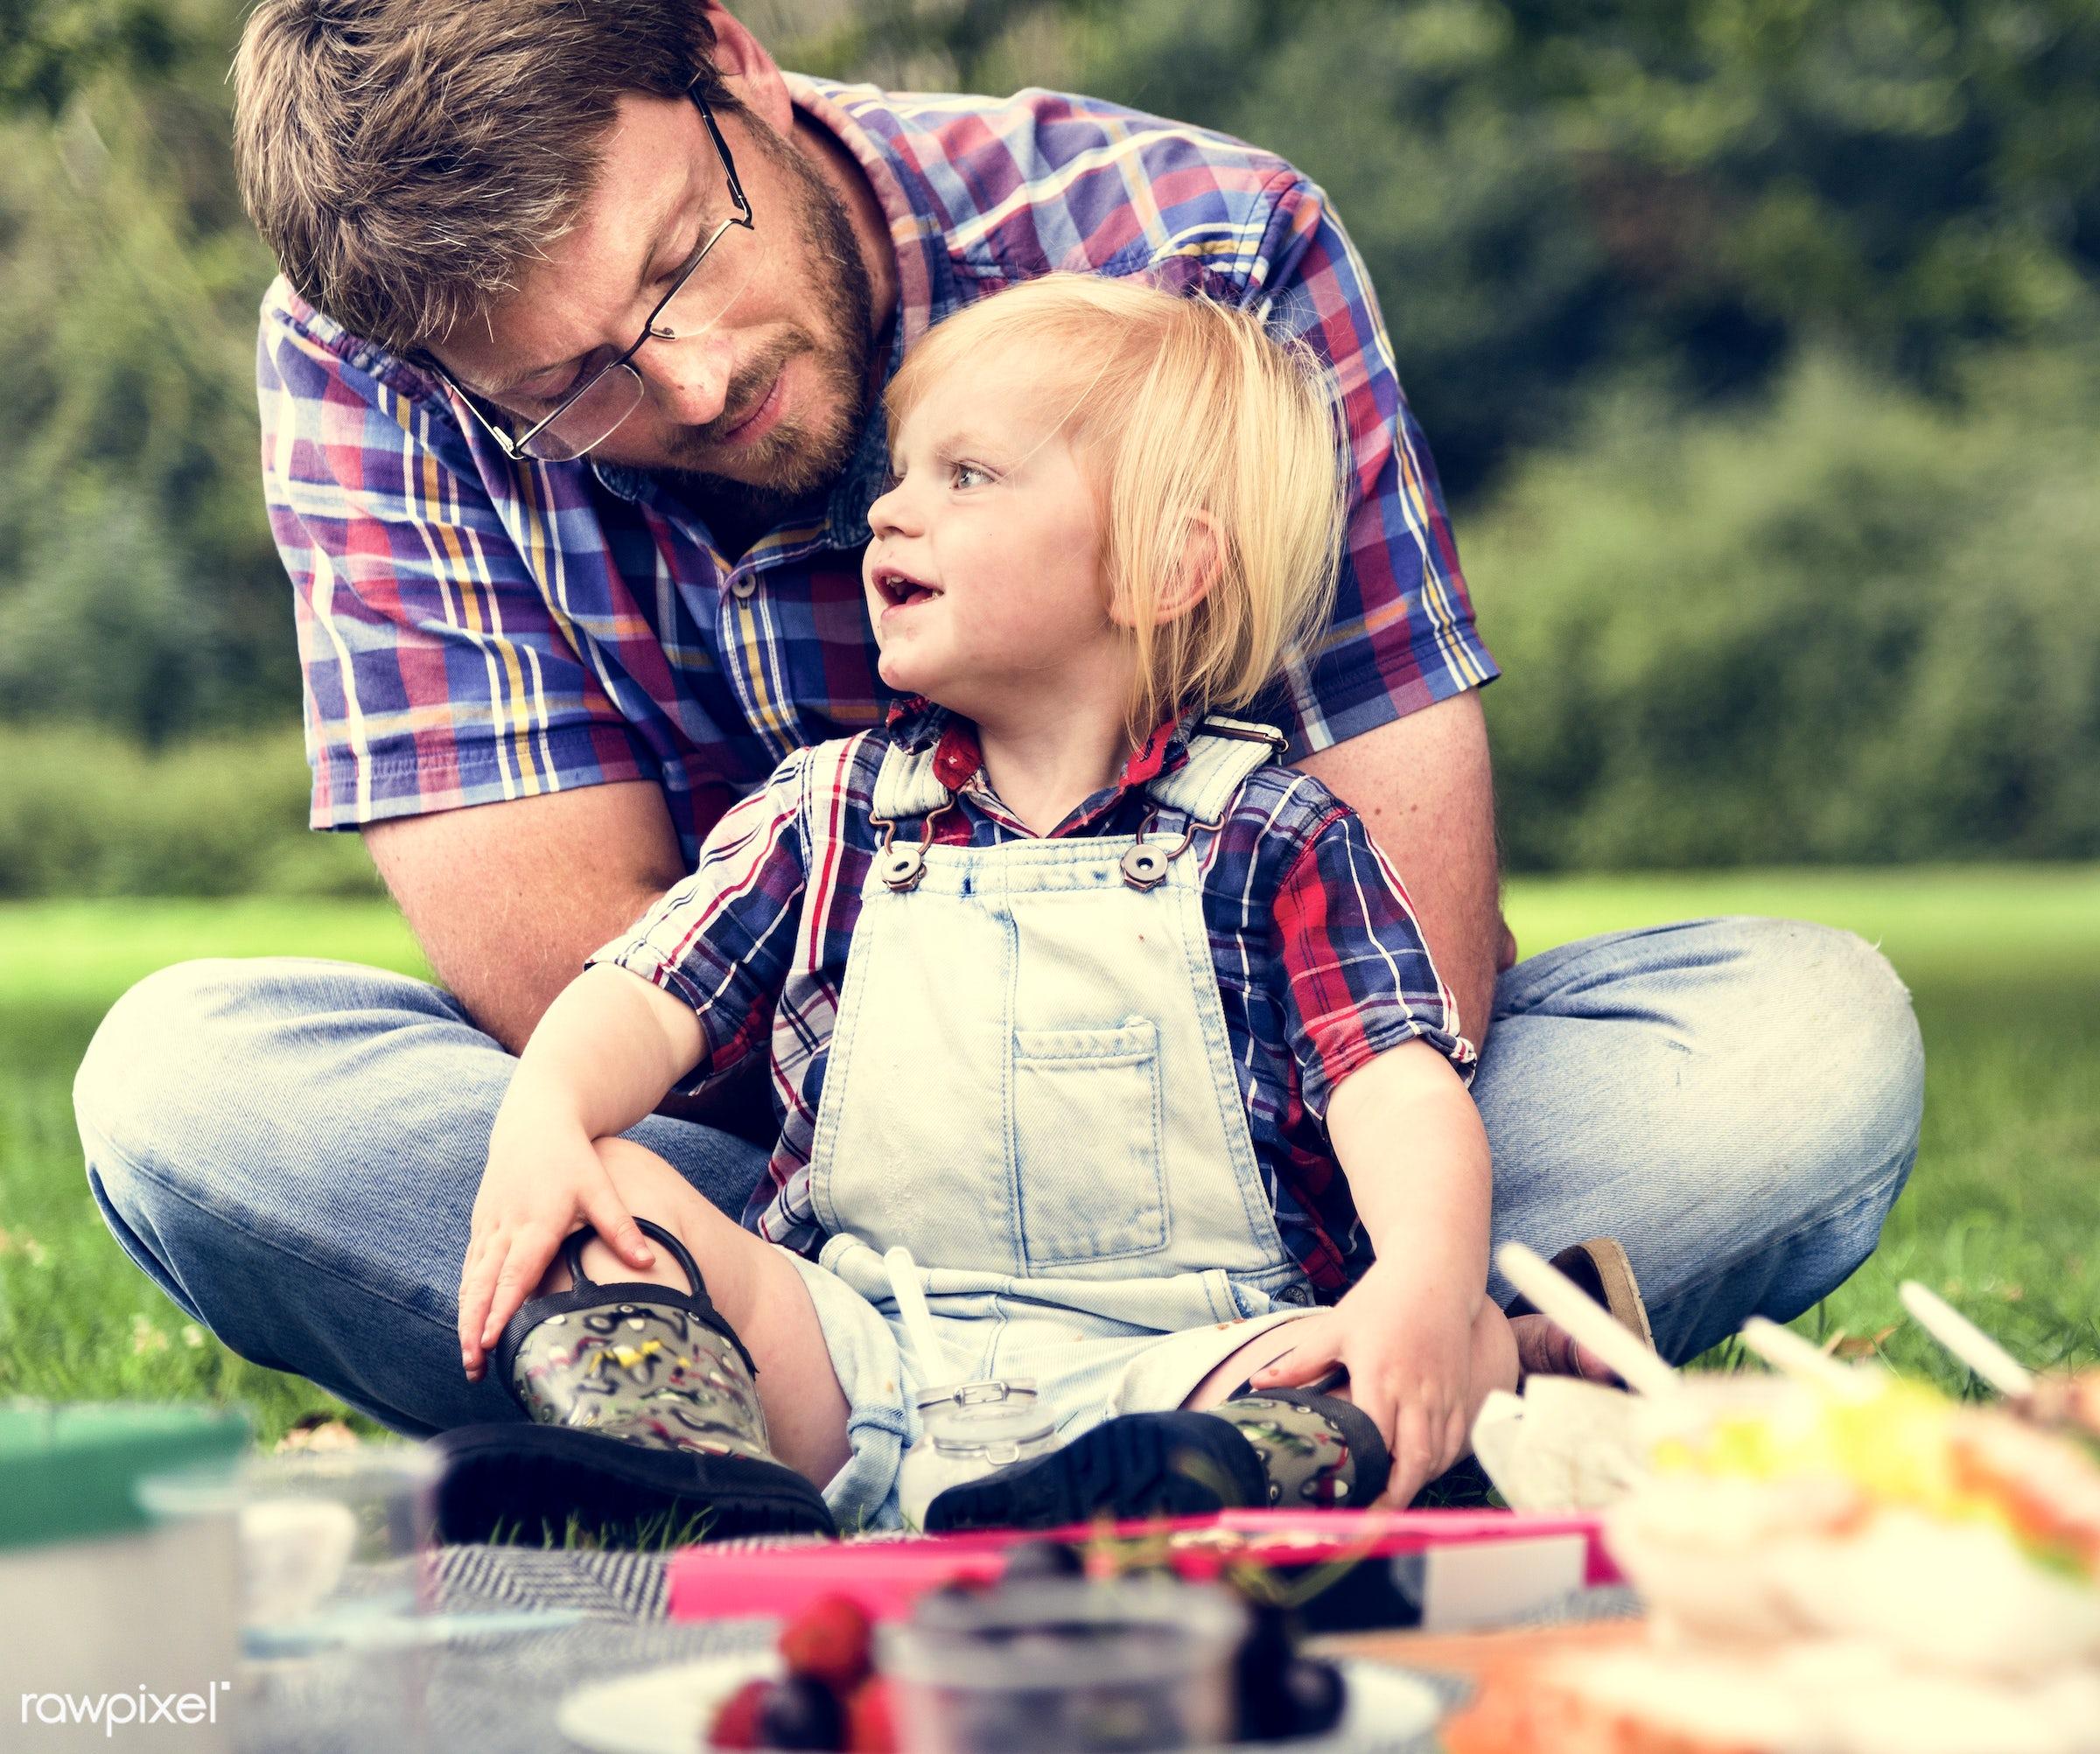 bonding, boy, care, casual, cheerful, child, childhood, enjoyment, environmental, family, father, field, food, fun, garden,...